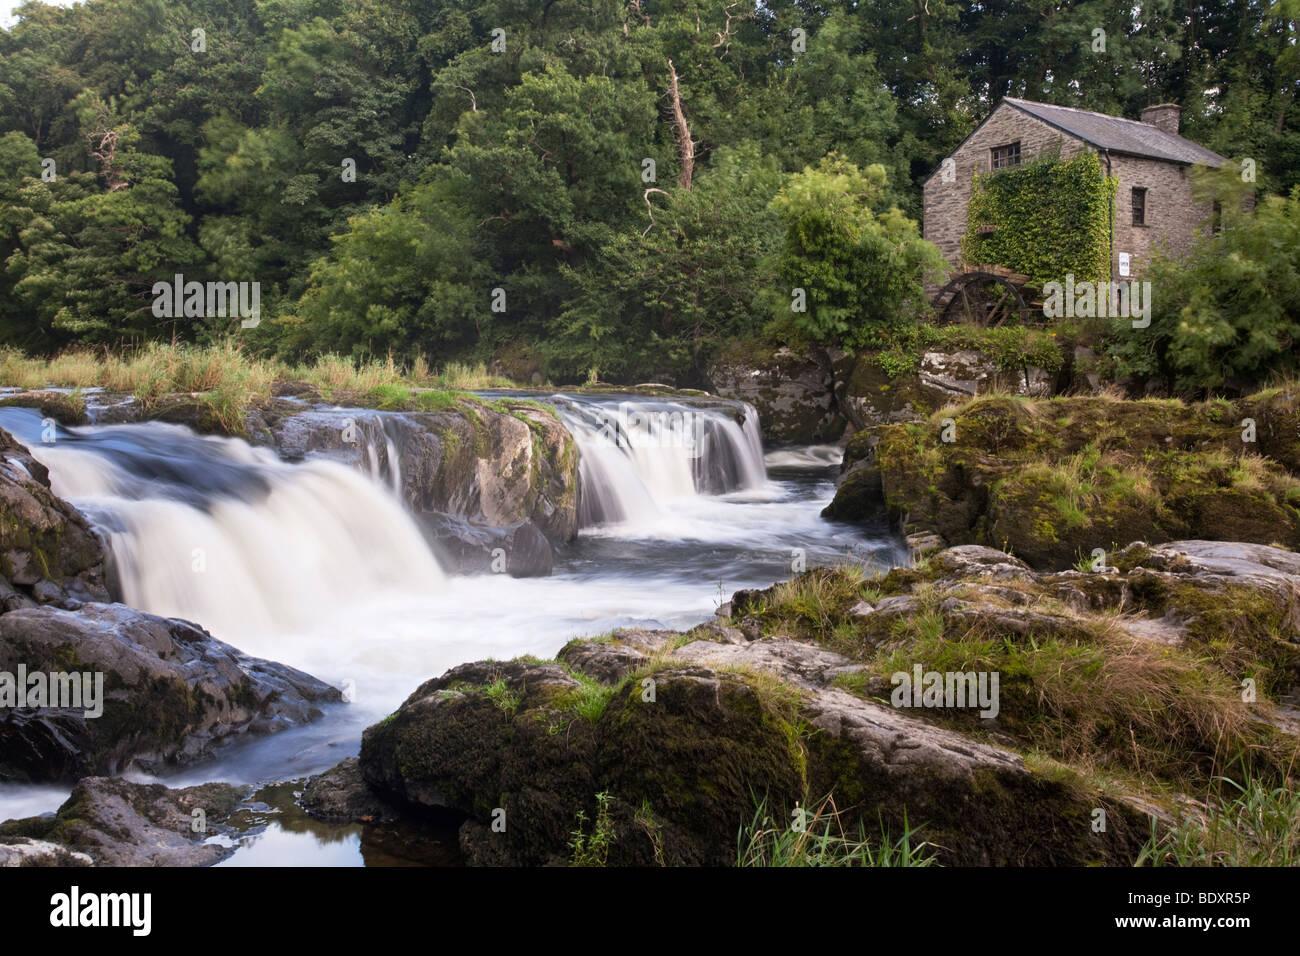 Cenarth Falls on the Afon Teifi, Pembrokeshire, Wales, Uk Stock Photo